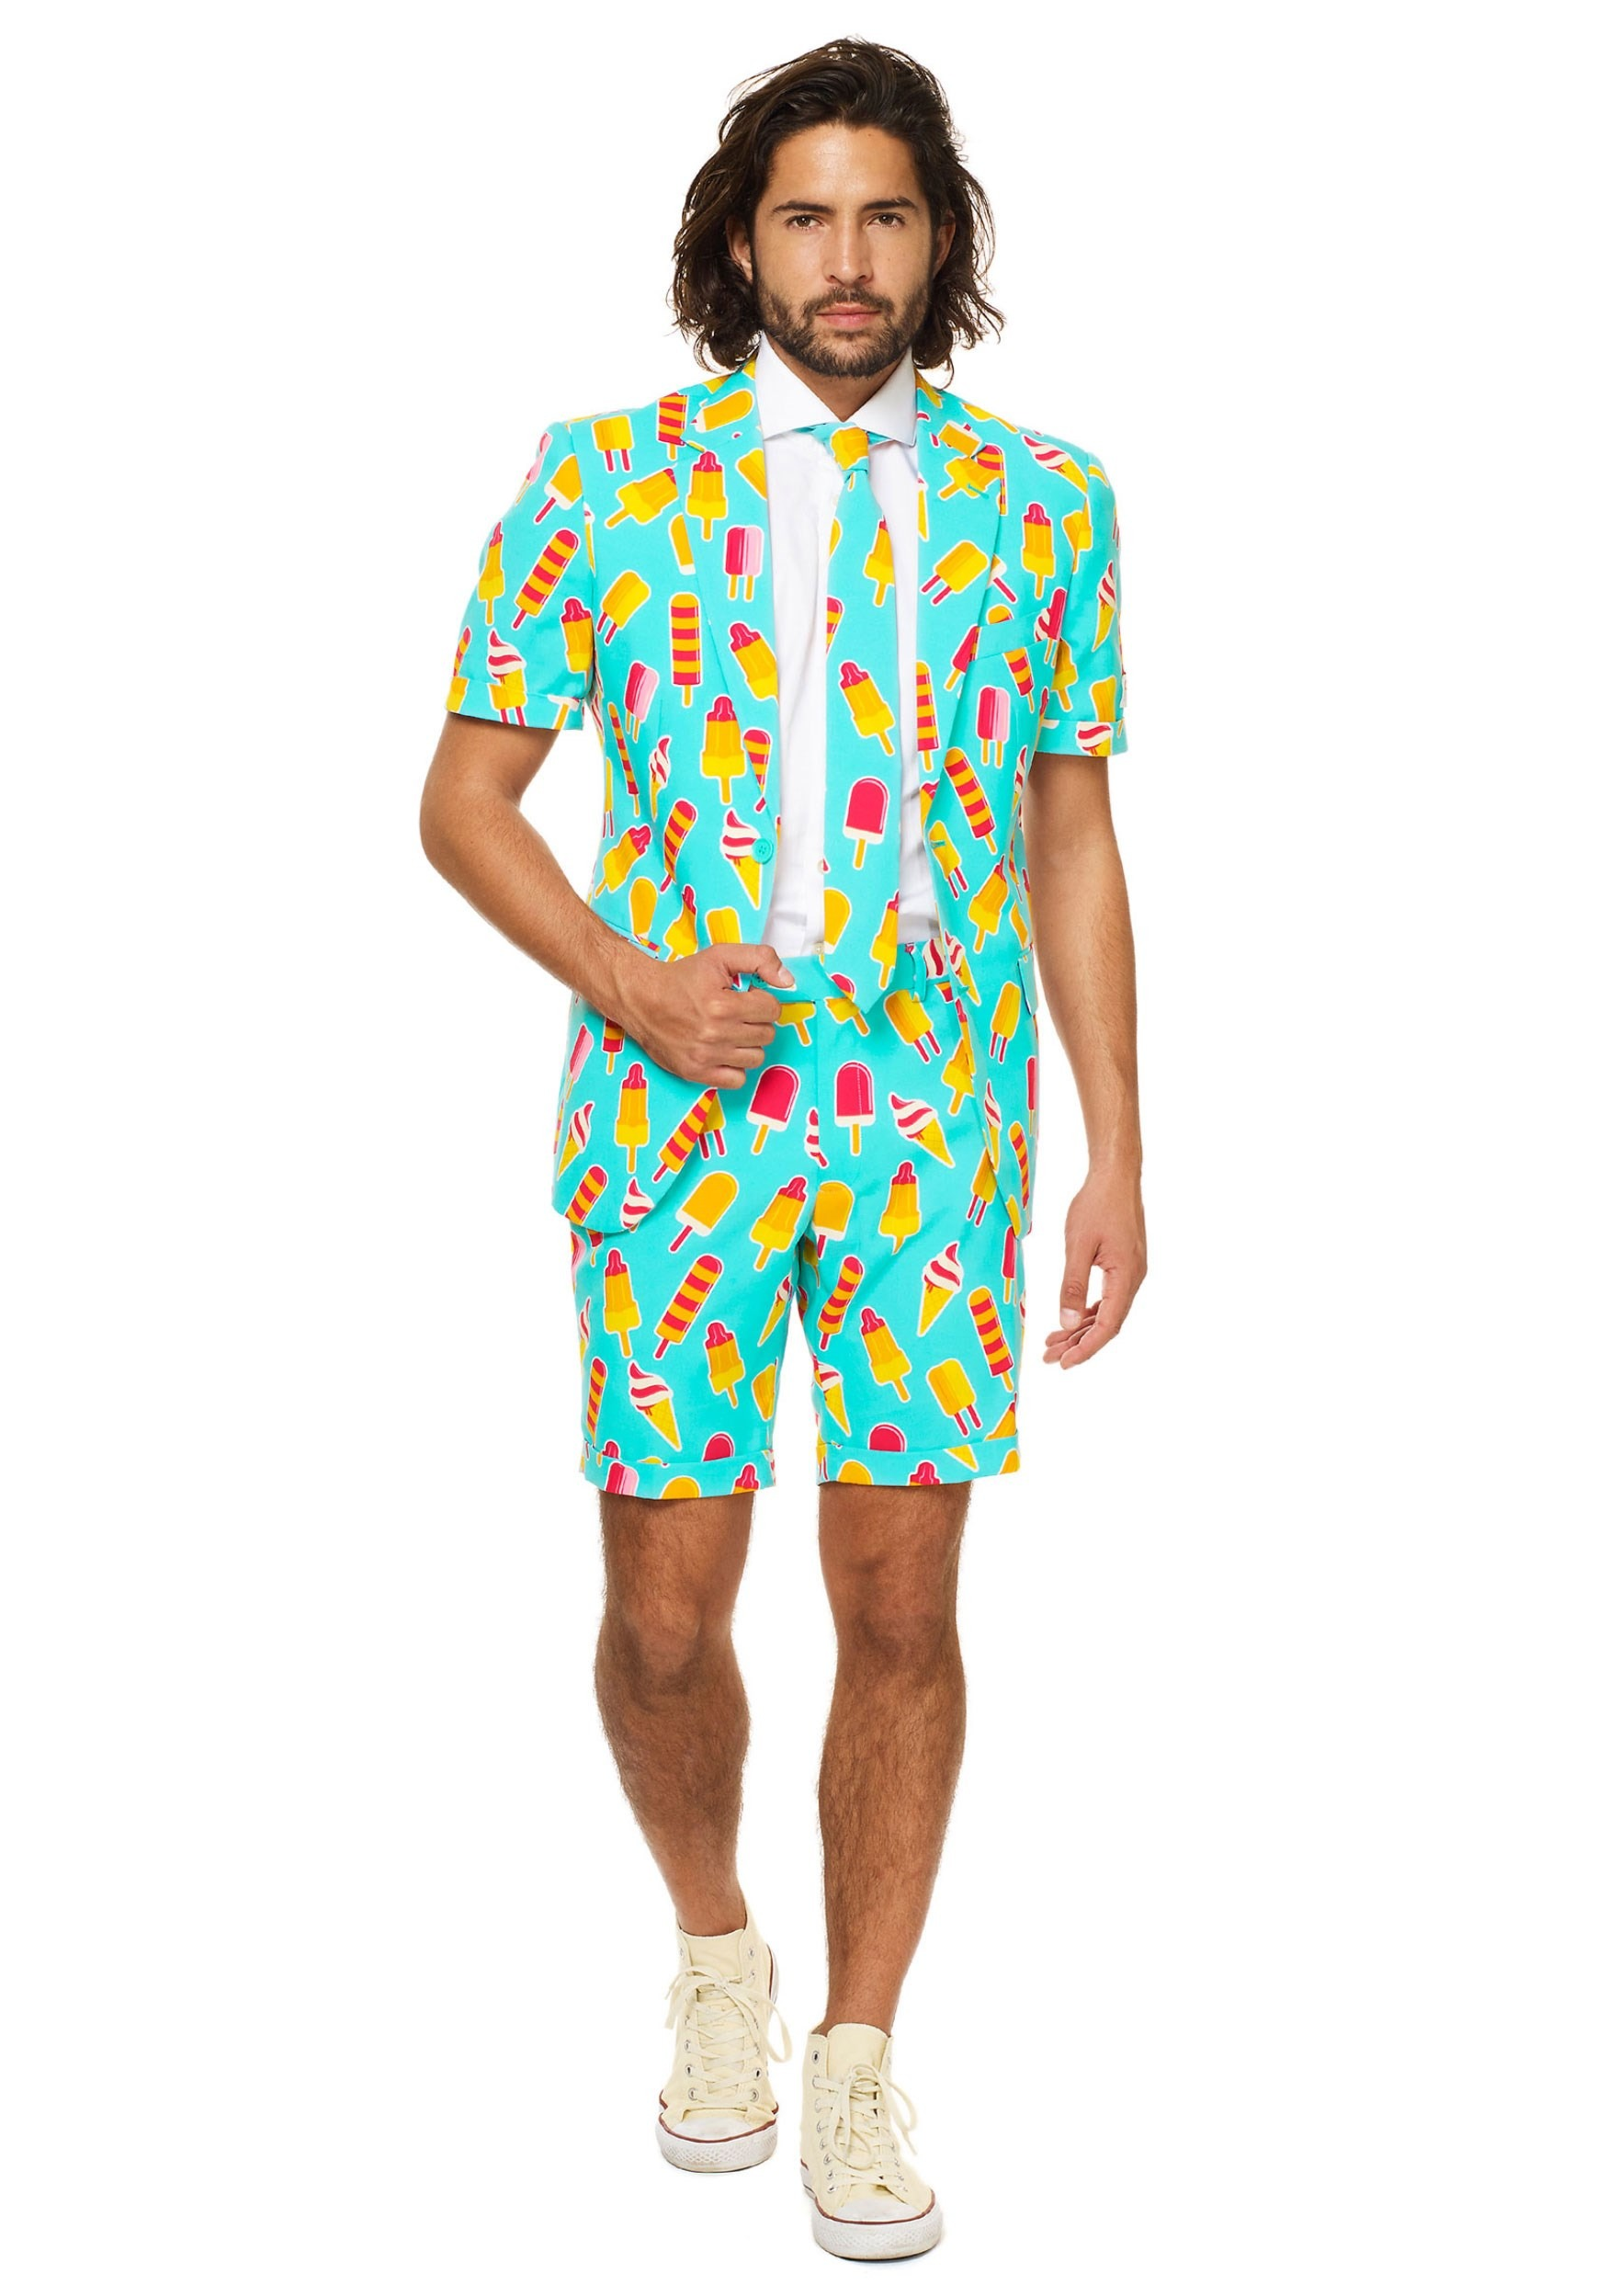 Opposuit Iceman Summer Suit for Men